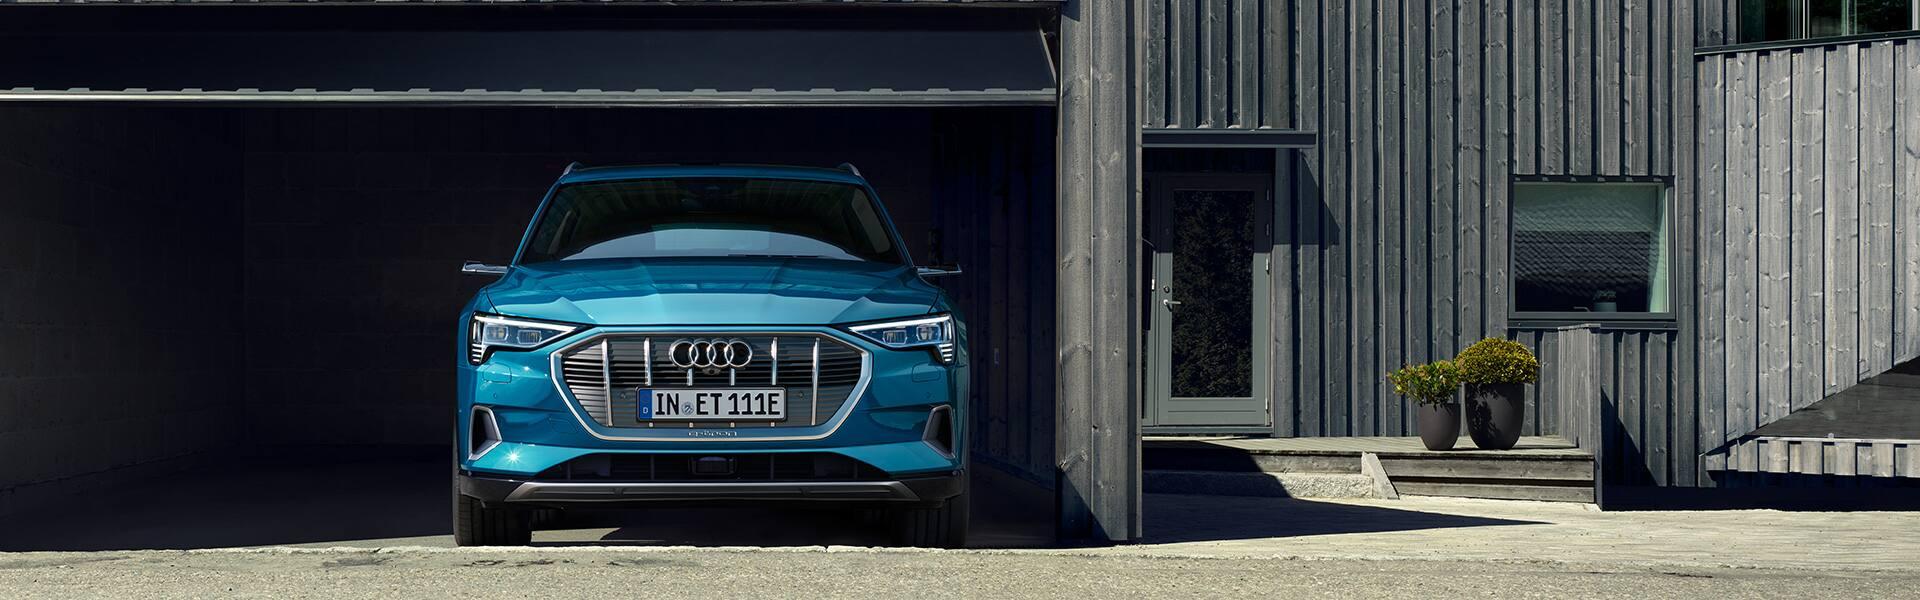 E Tron Im Alltag Audi Tron Audi Deutschland